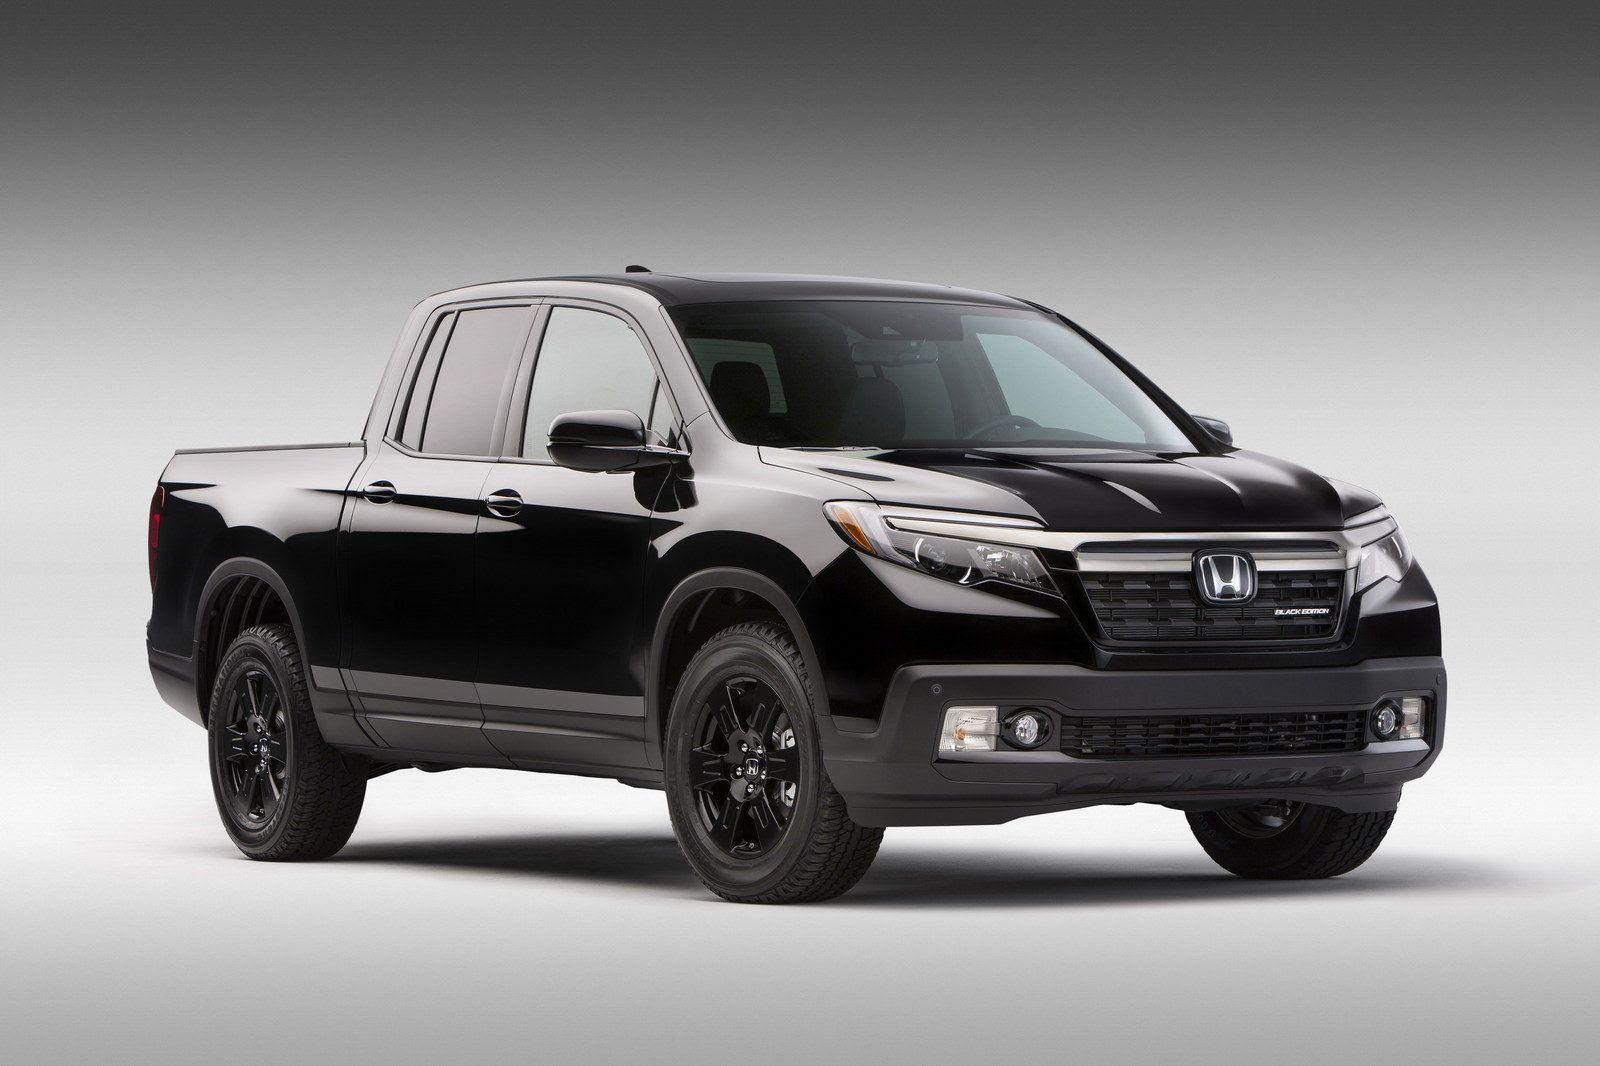 2016 Honda Ridgeline - Picture 661628 | truck review @ Top ...